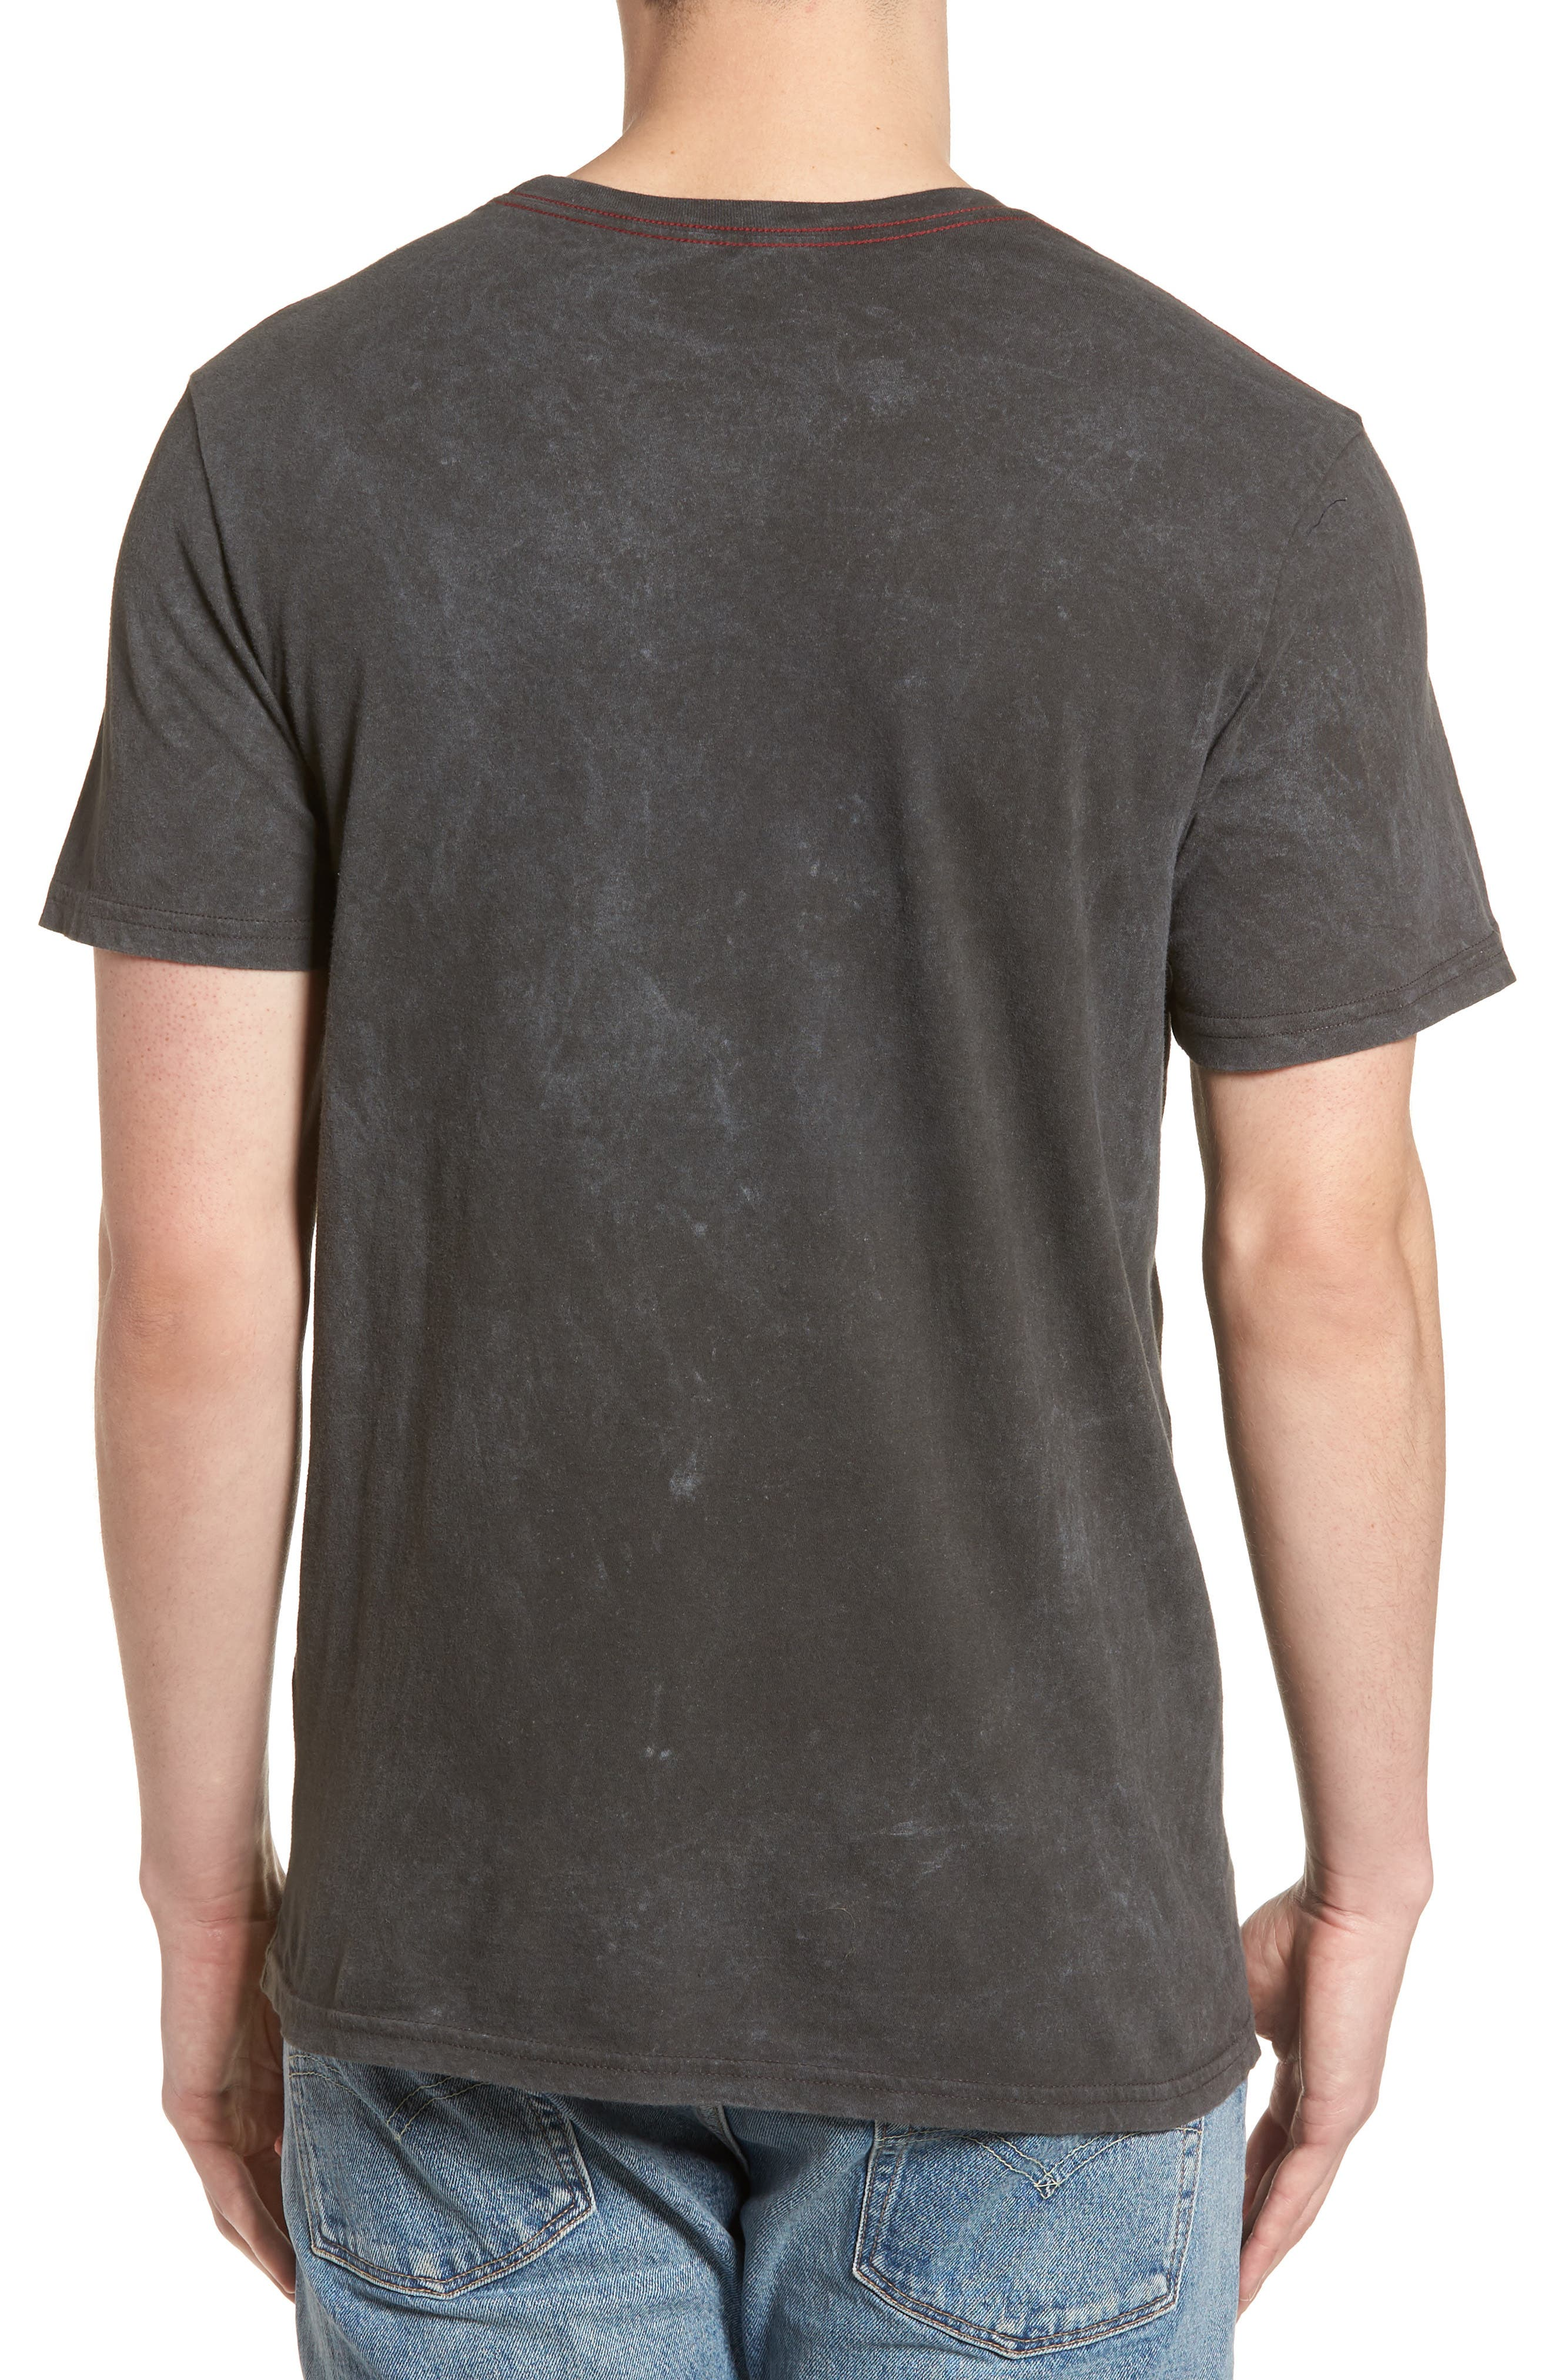 Big Deal T-Shirt,                             Alternate thumbnail 2, color,                             008